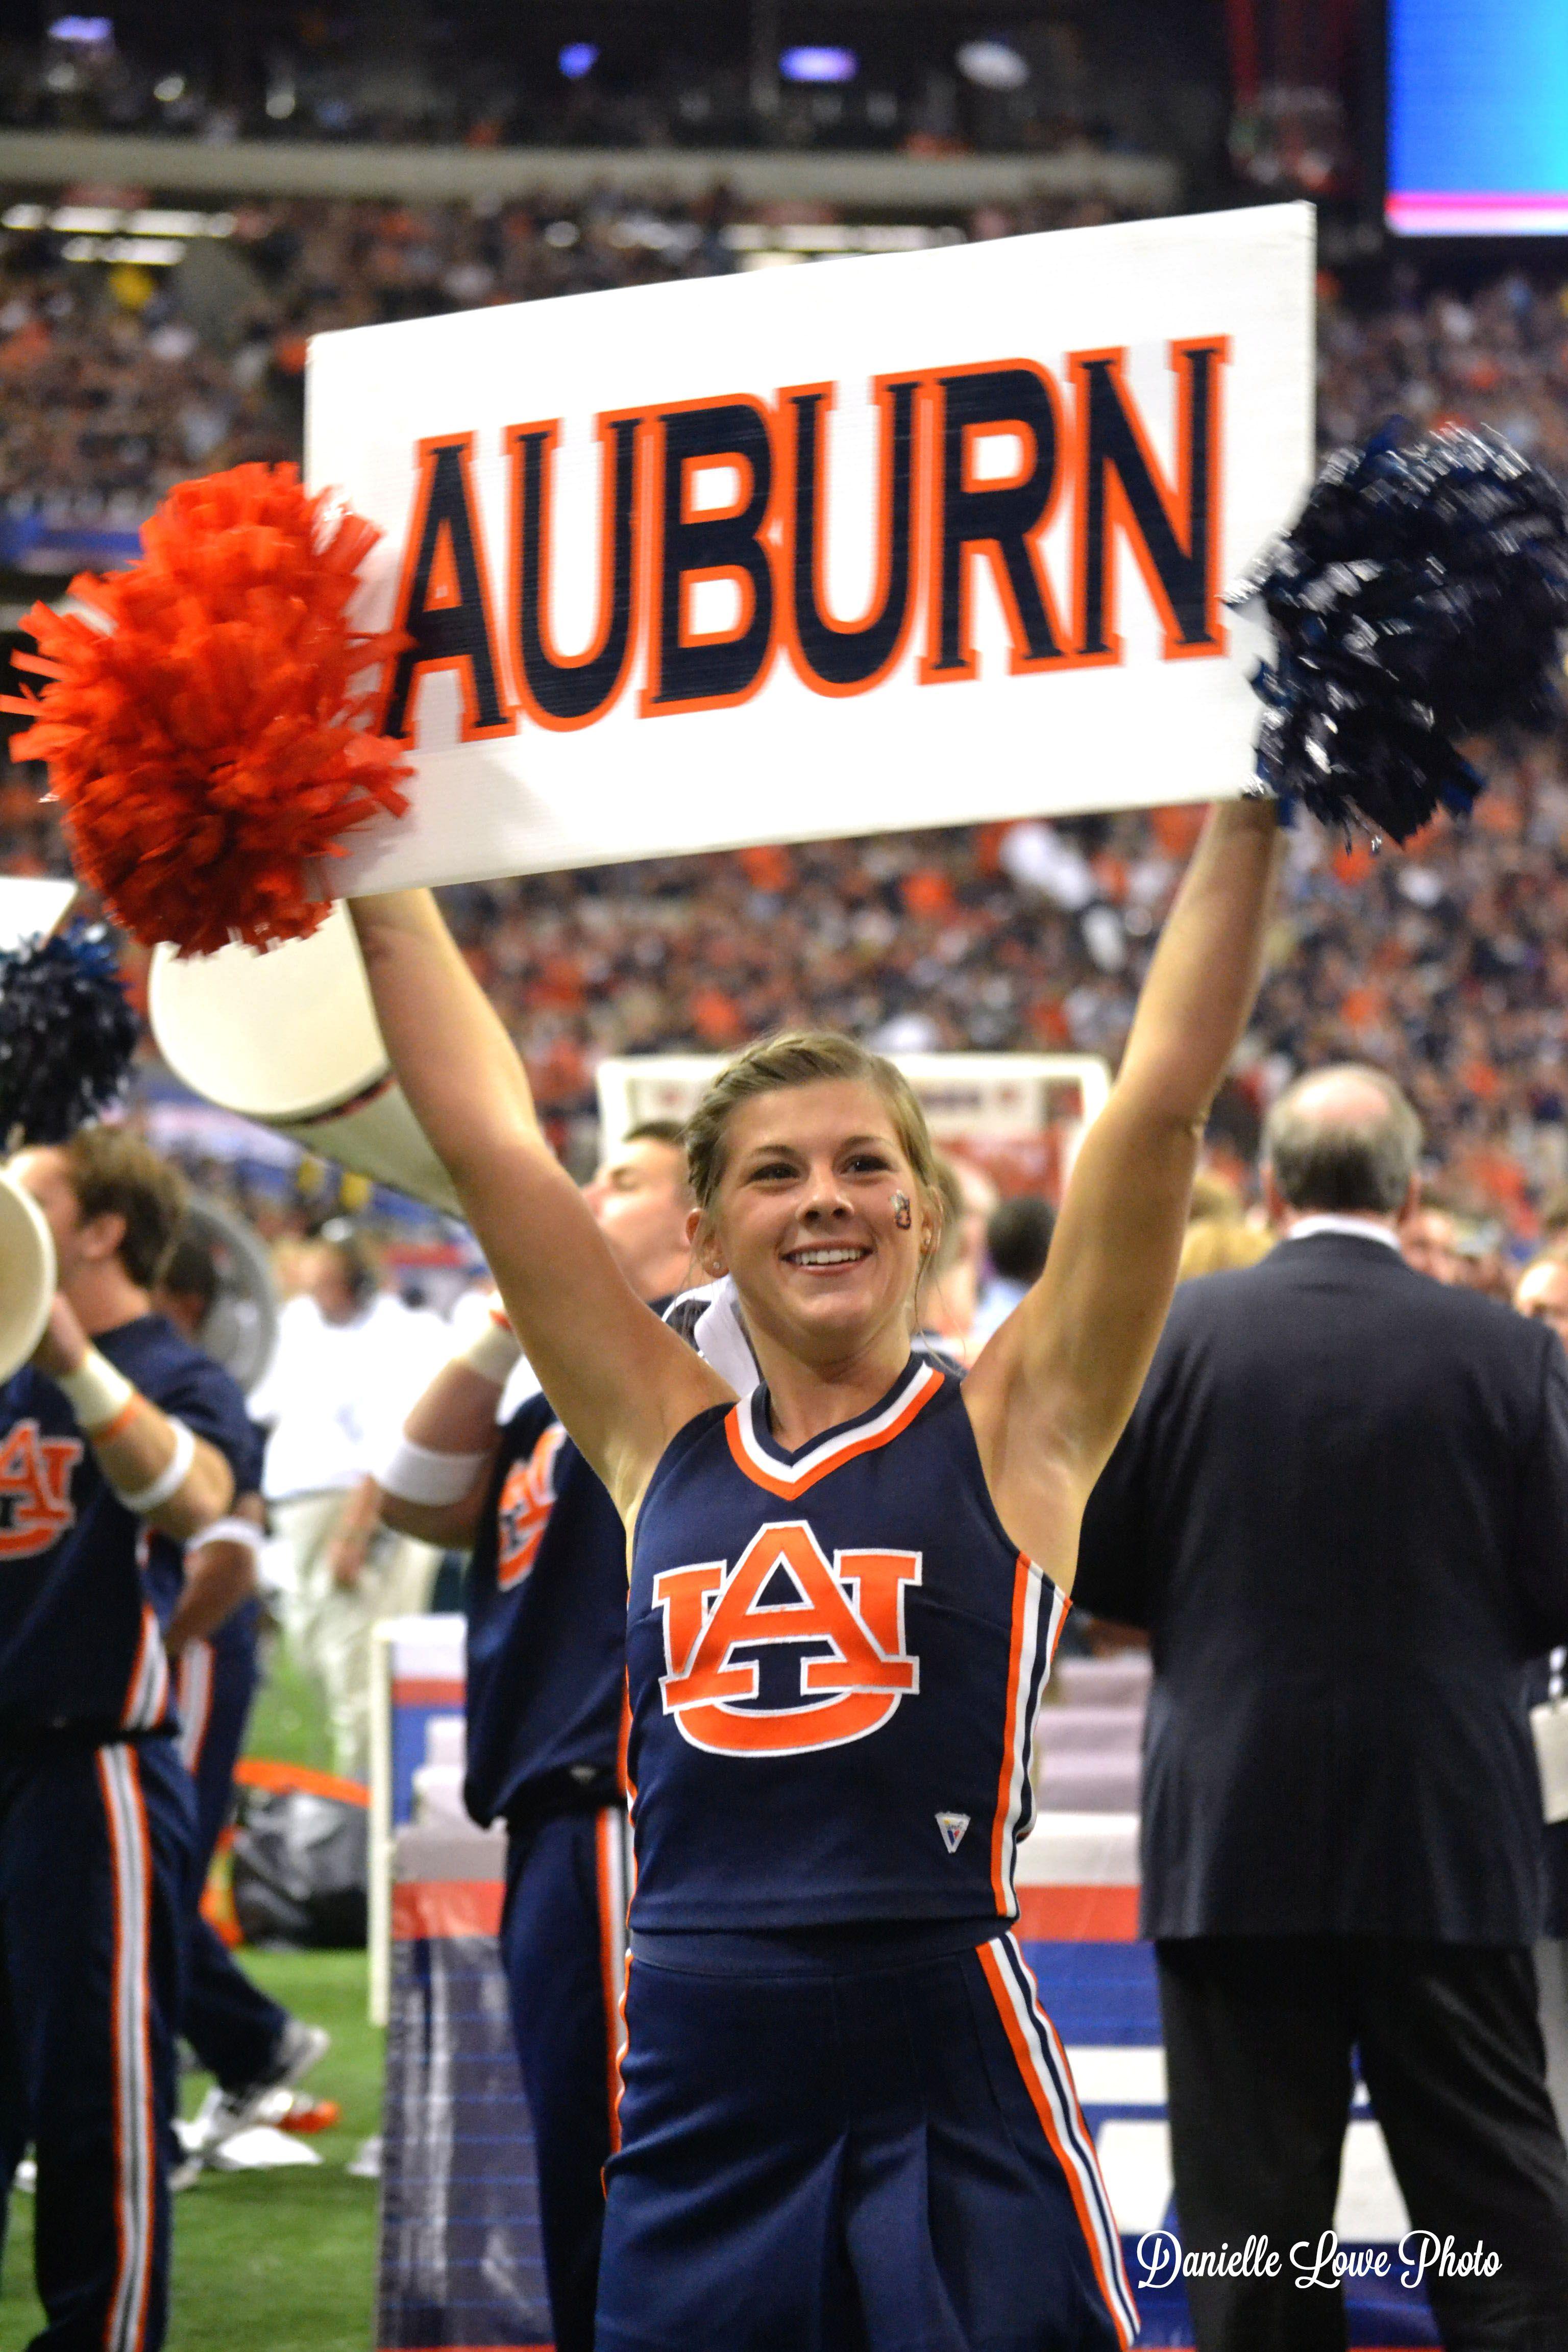 Auburn cheerleader lindsey wilson photo credit danielle